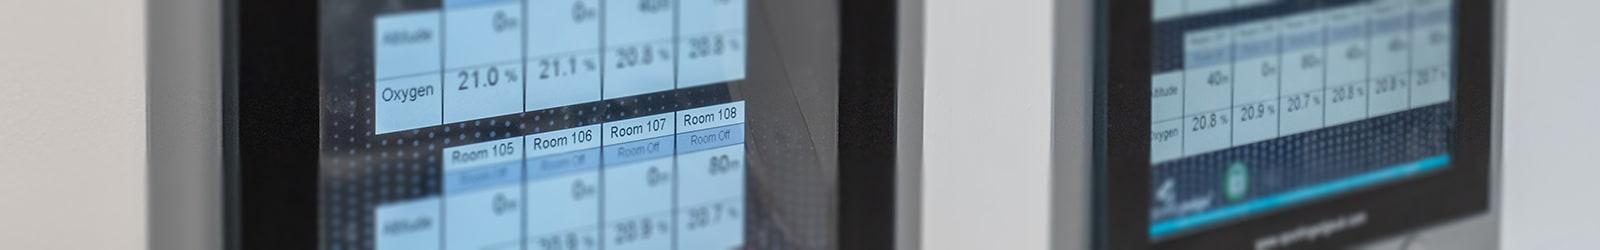 Altitude Panel Banner Blurred